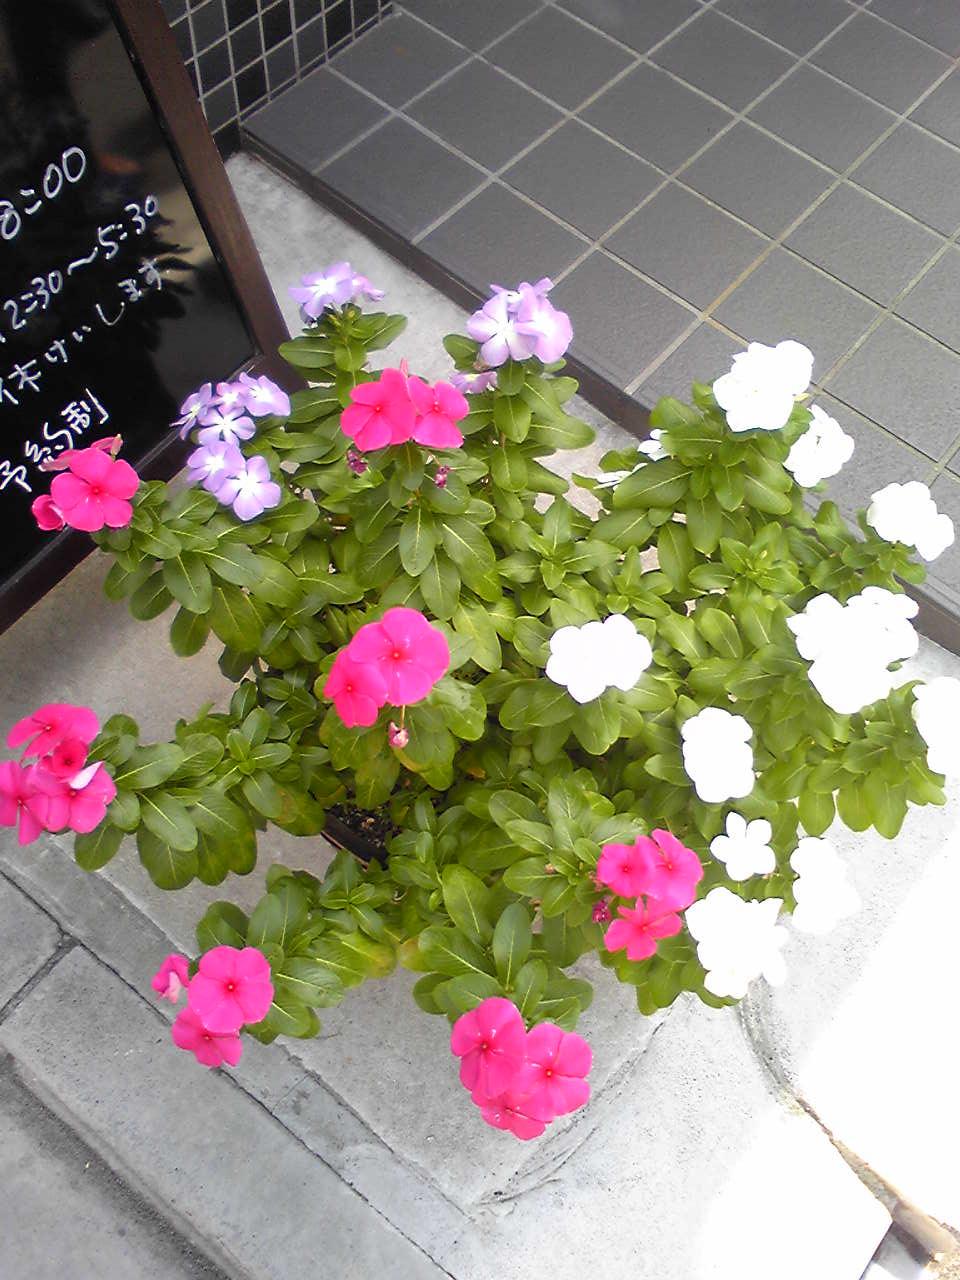 randam flowers